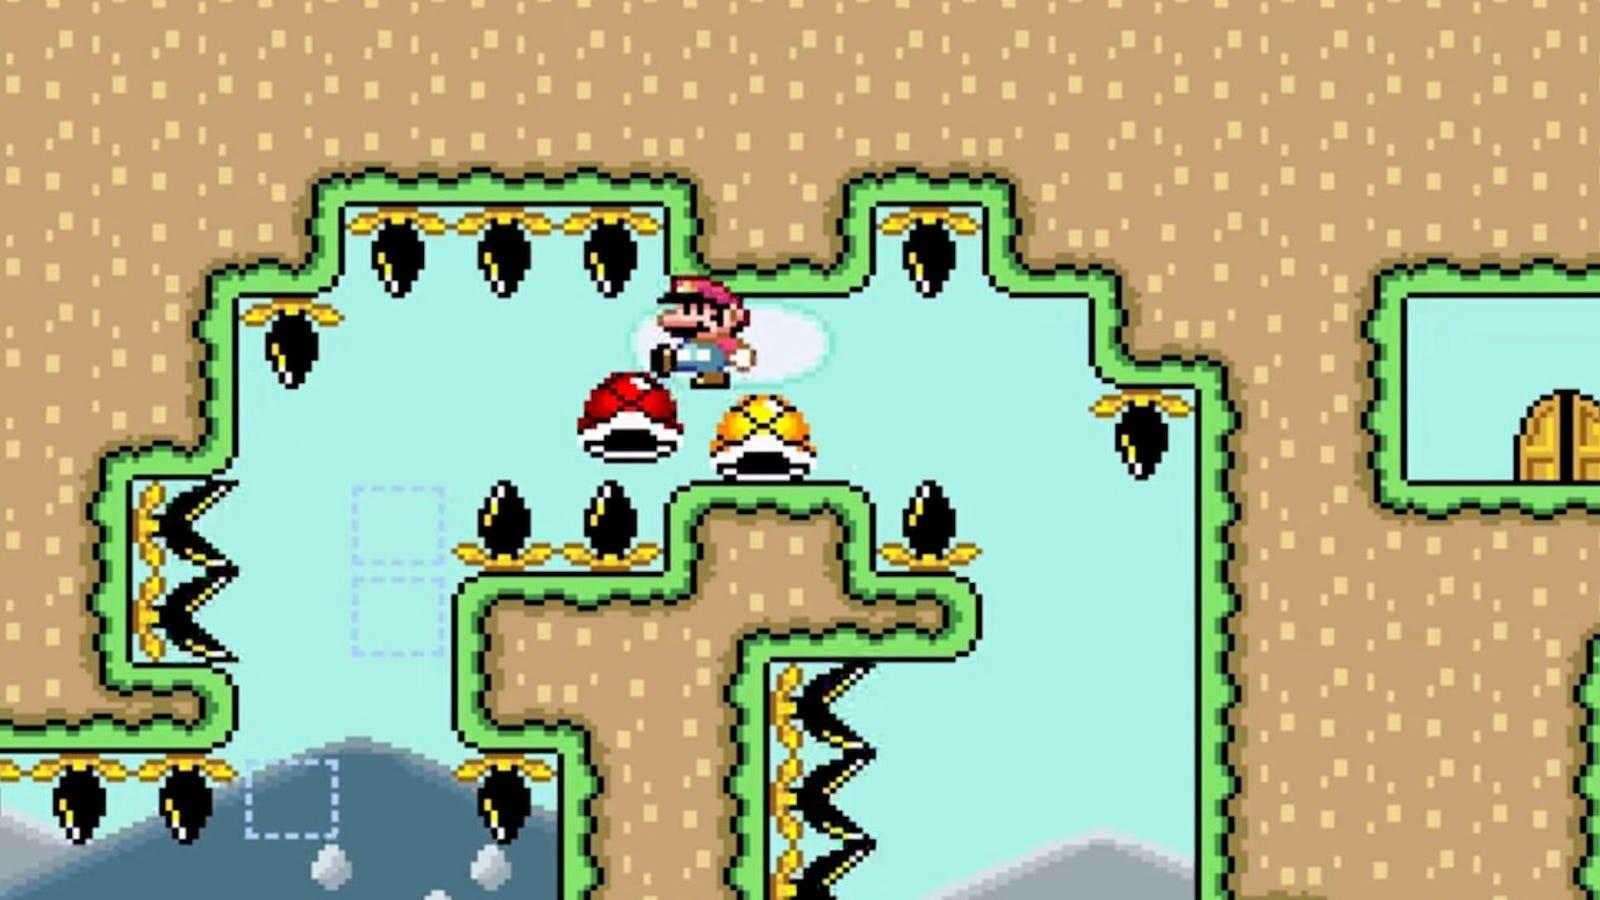 Logran superar el nivel de Super Mario World más difícil del mundo